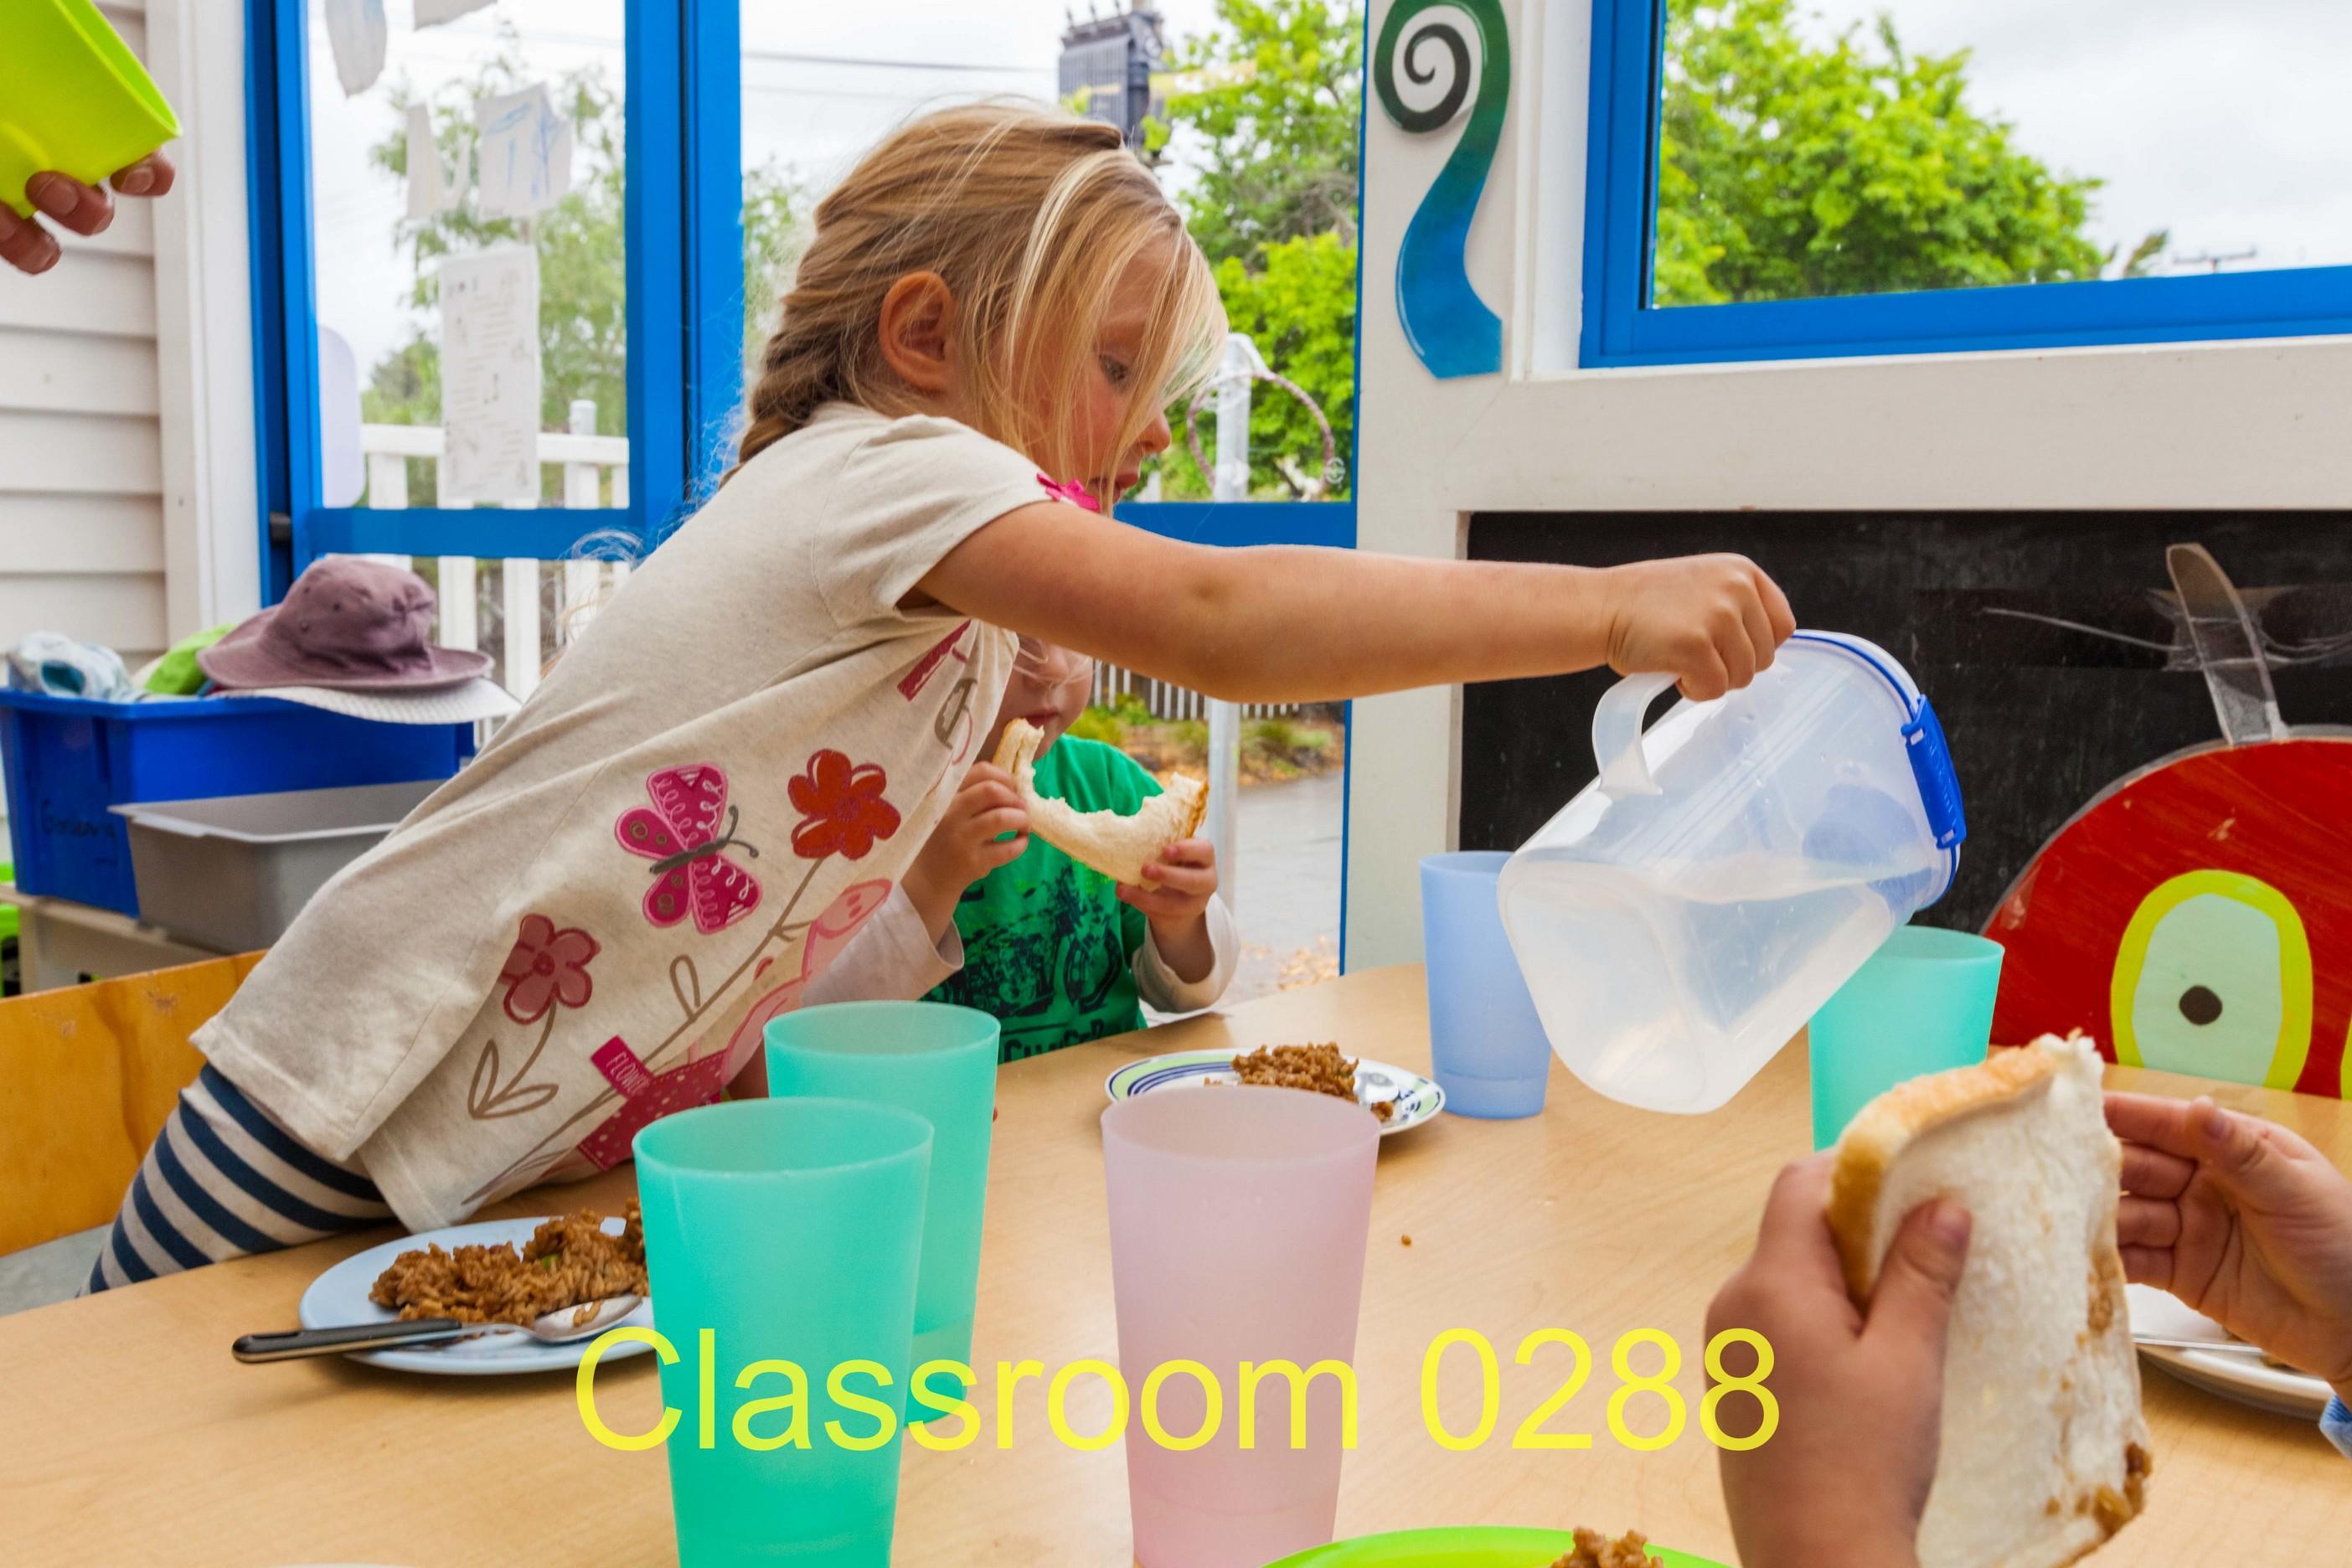 Classroom 0288